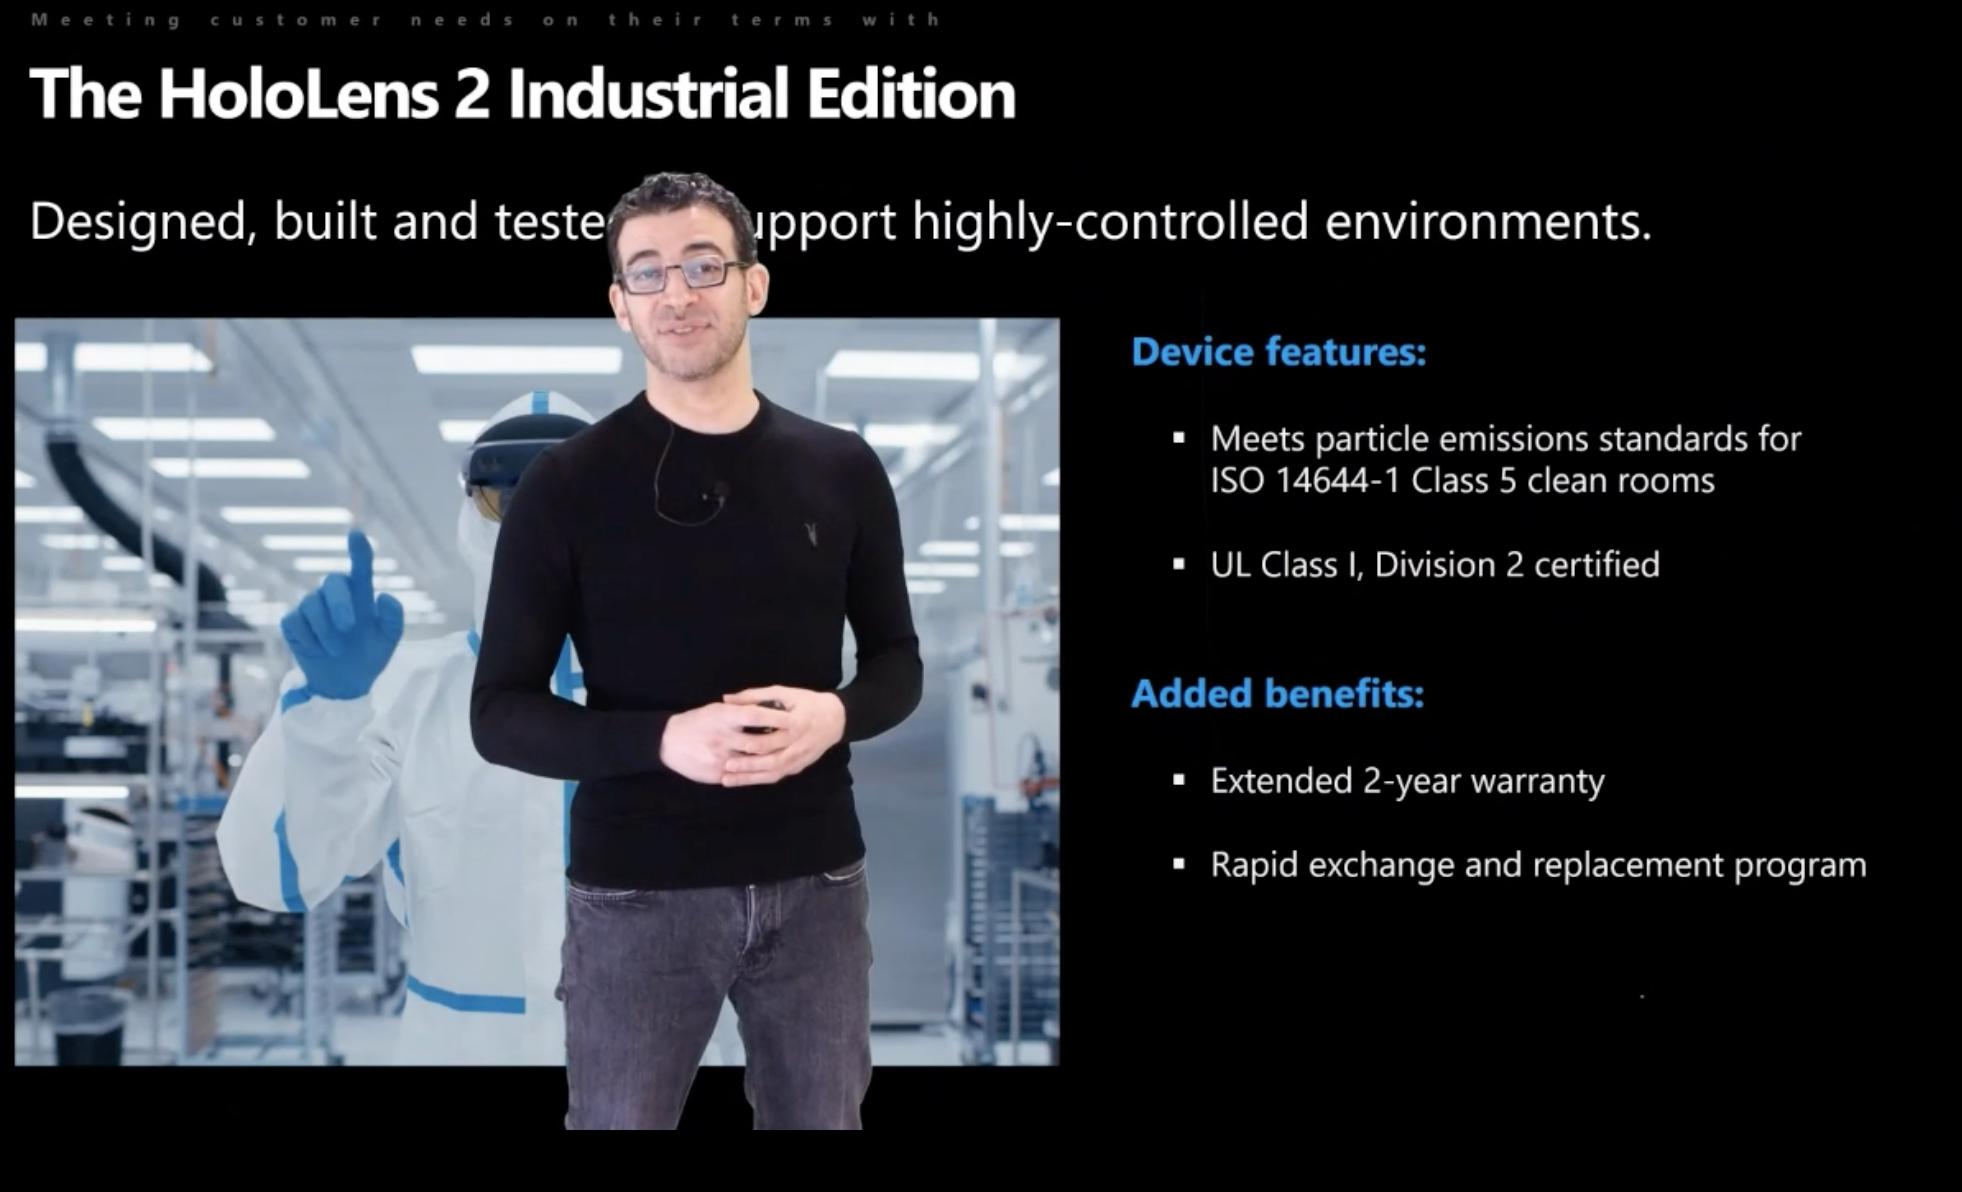 hololens 2 industrial ed